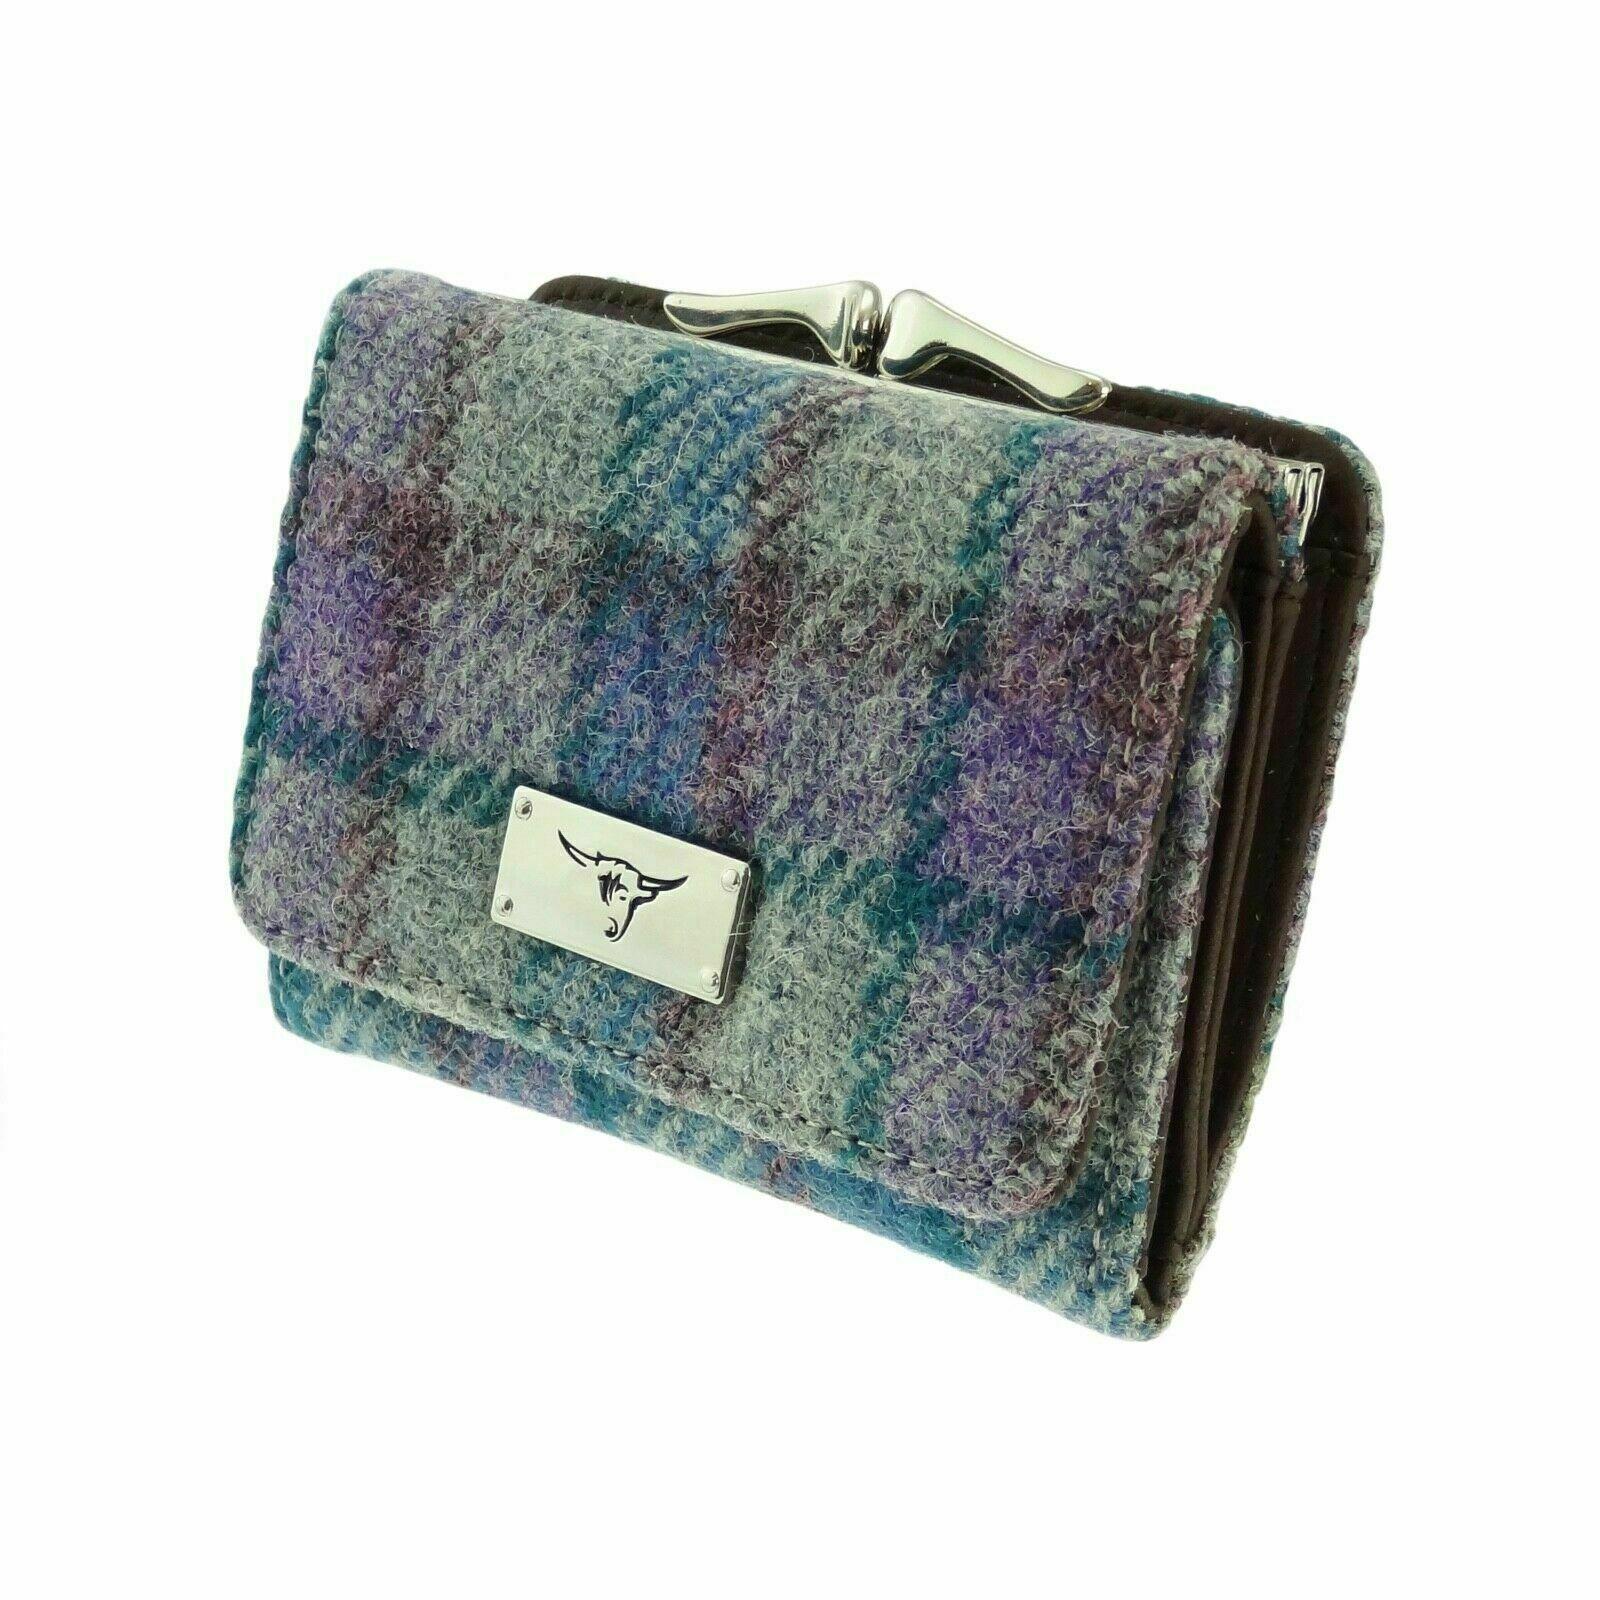 Ladies Harris Tweed Clasp Purse Unst Blue/Purple Check on Grey COL98 Brand New